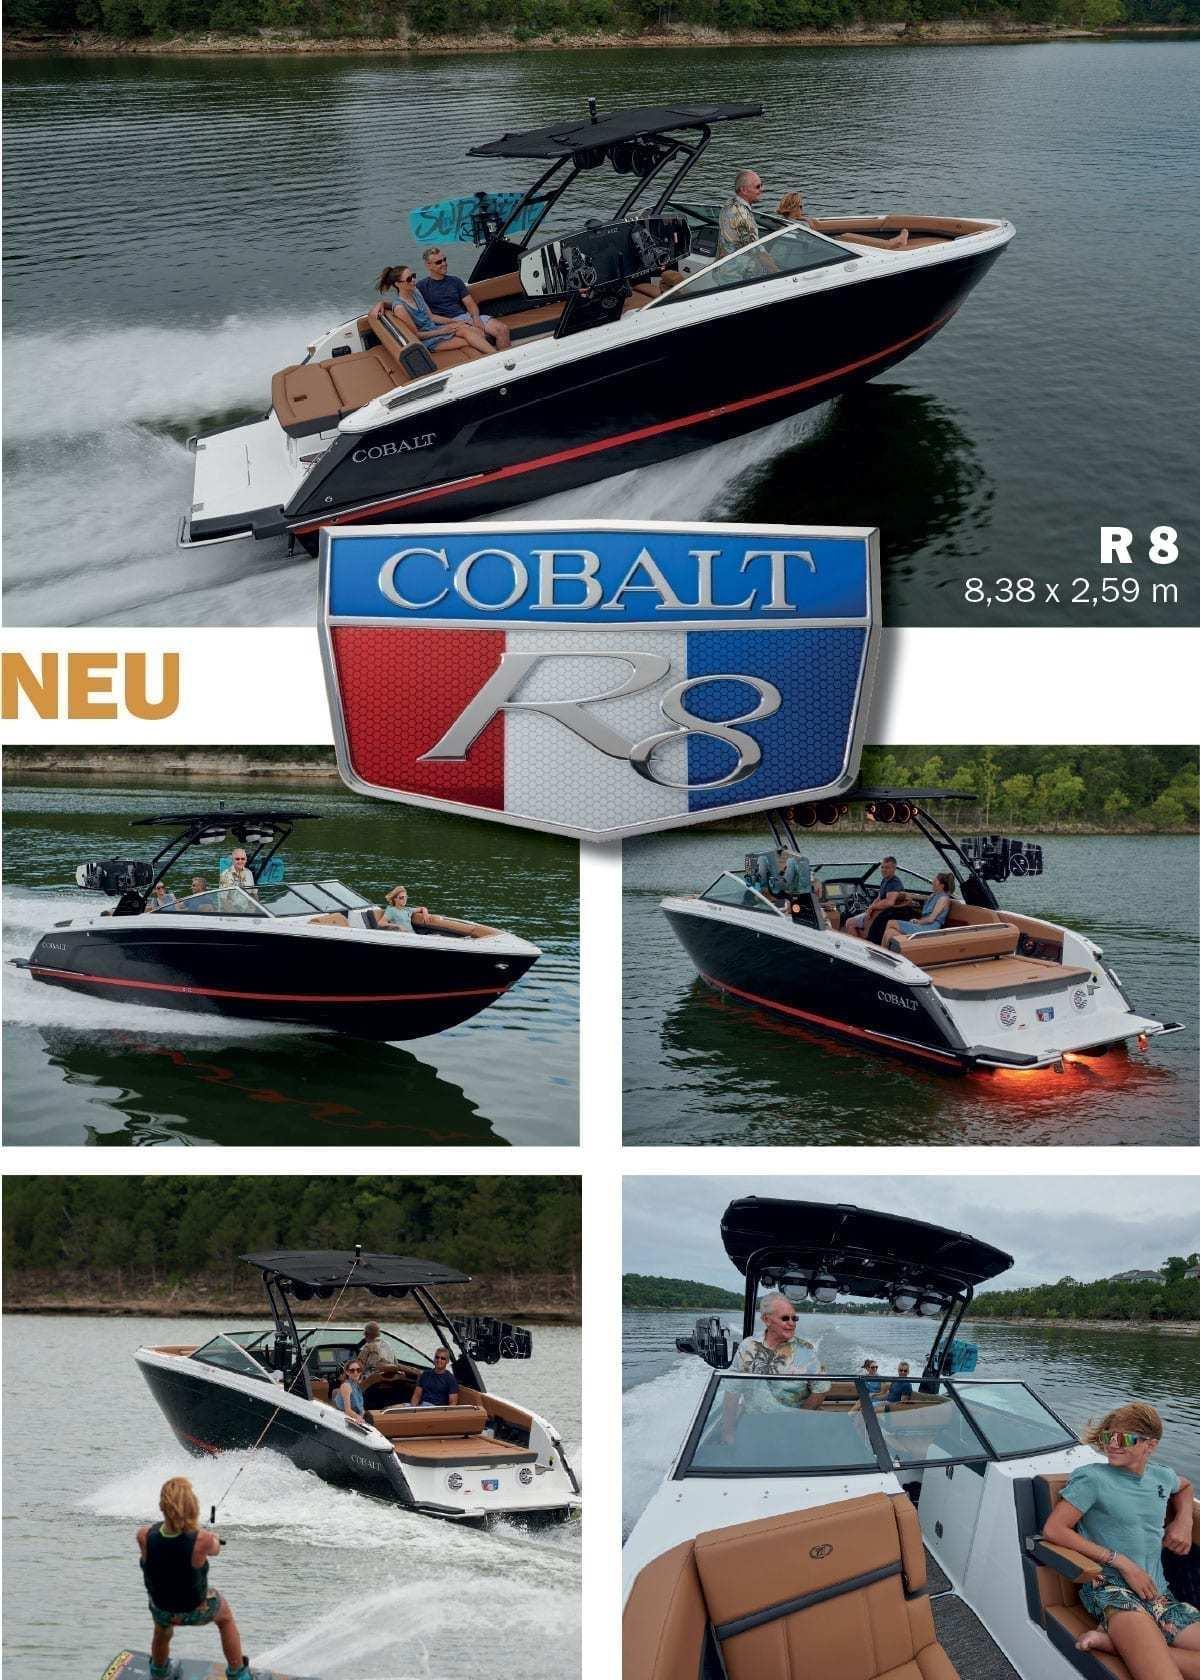 Cobalt Boats - R8